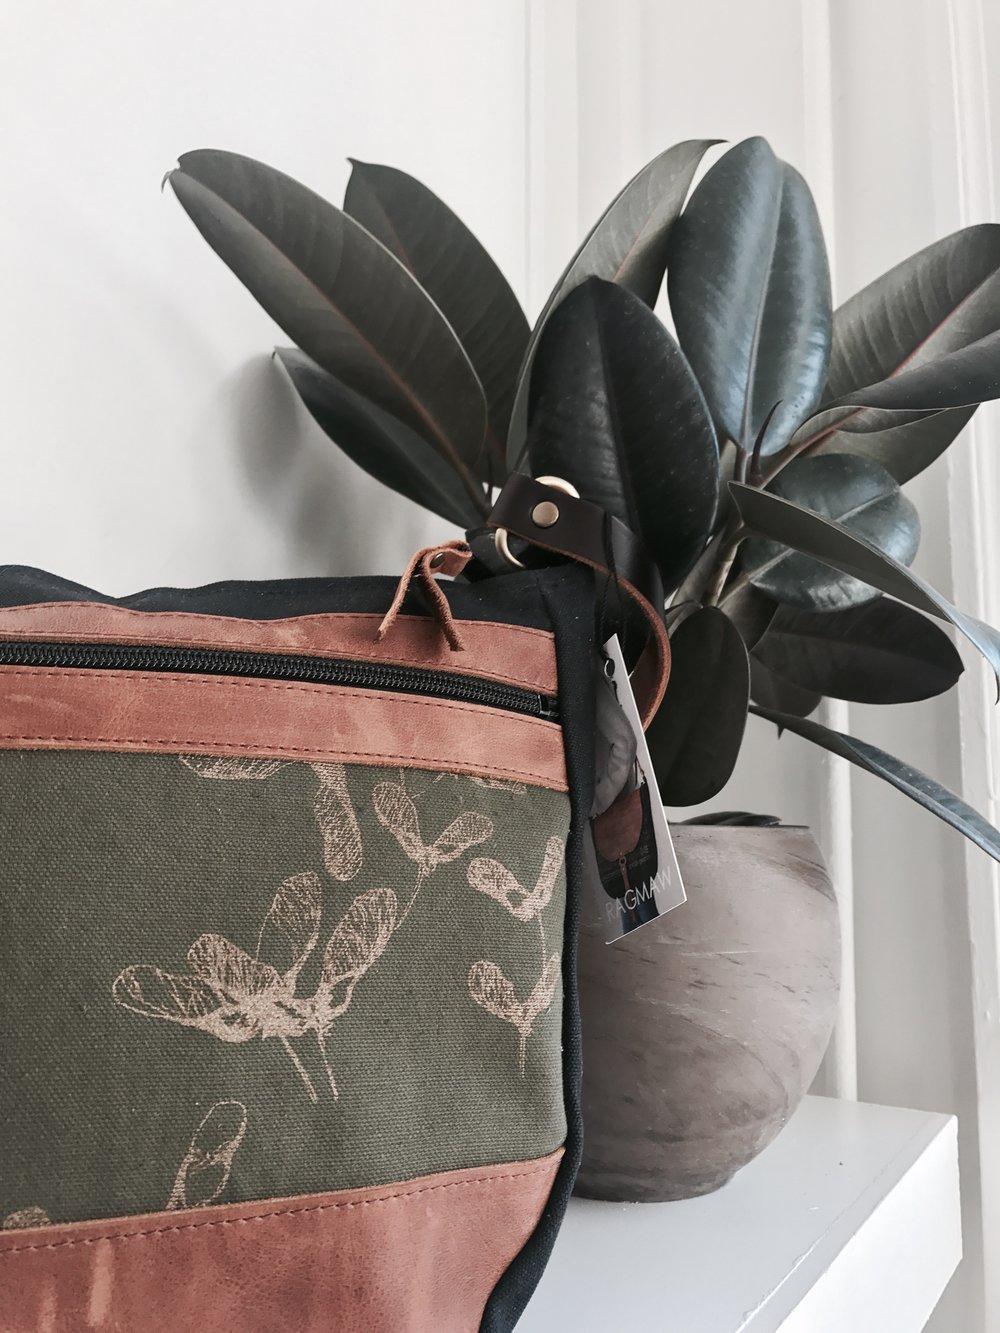 ragmaw handbag purse clutch leather local made handmade st. john's newfoundland megan jackman